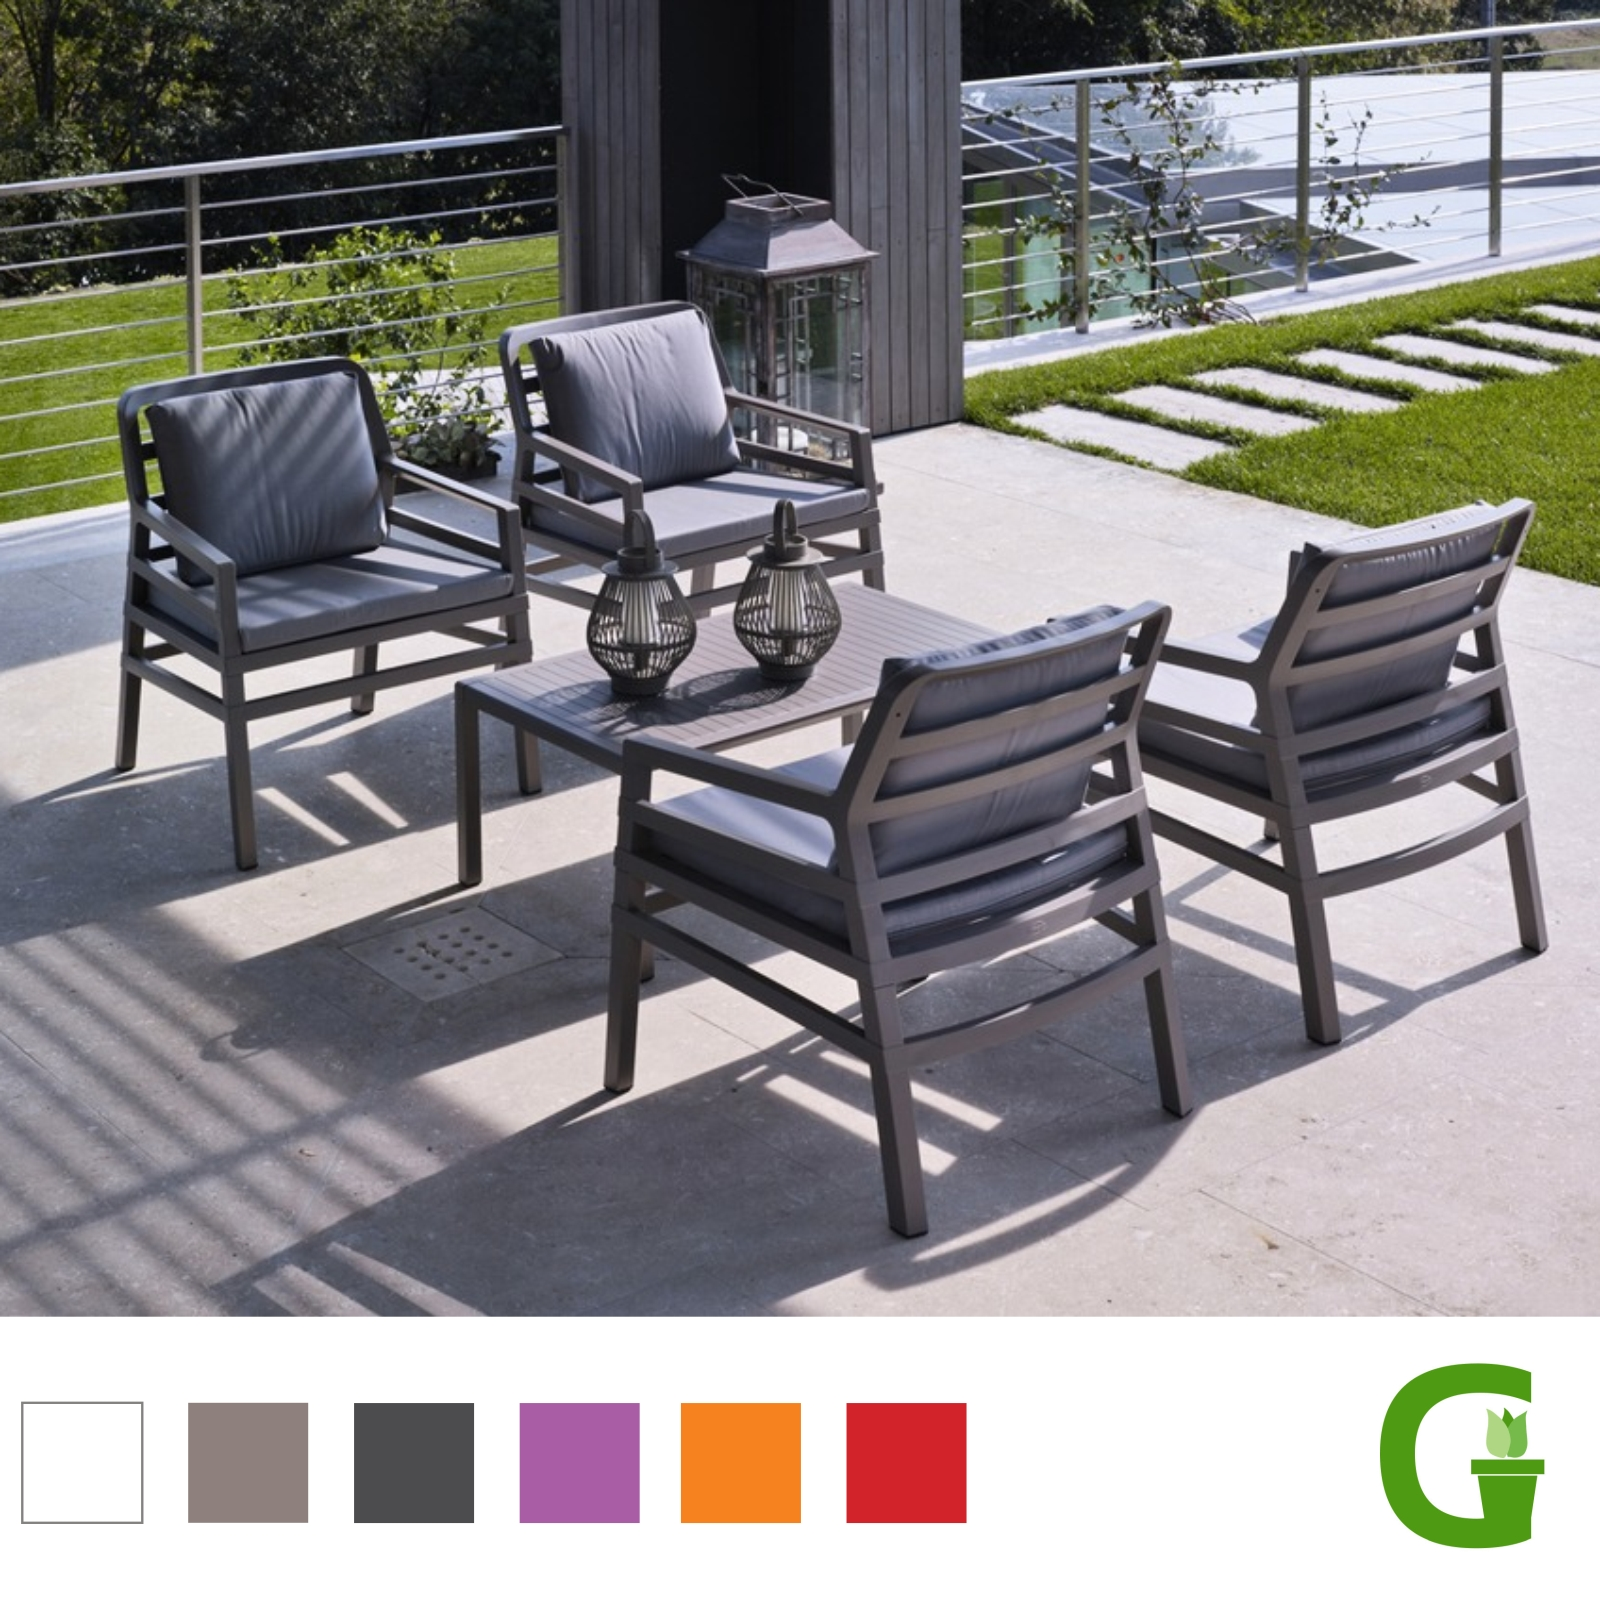 nardi aria lounge sessel in verschiedenen farben mit kissen arredo alles. Black Bedroom Furniture Sets. Home Design Ideas